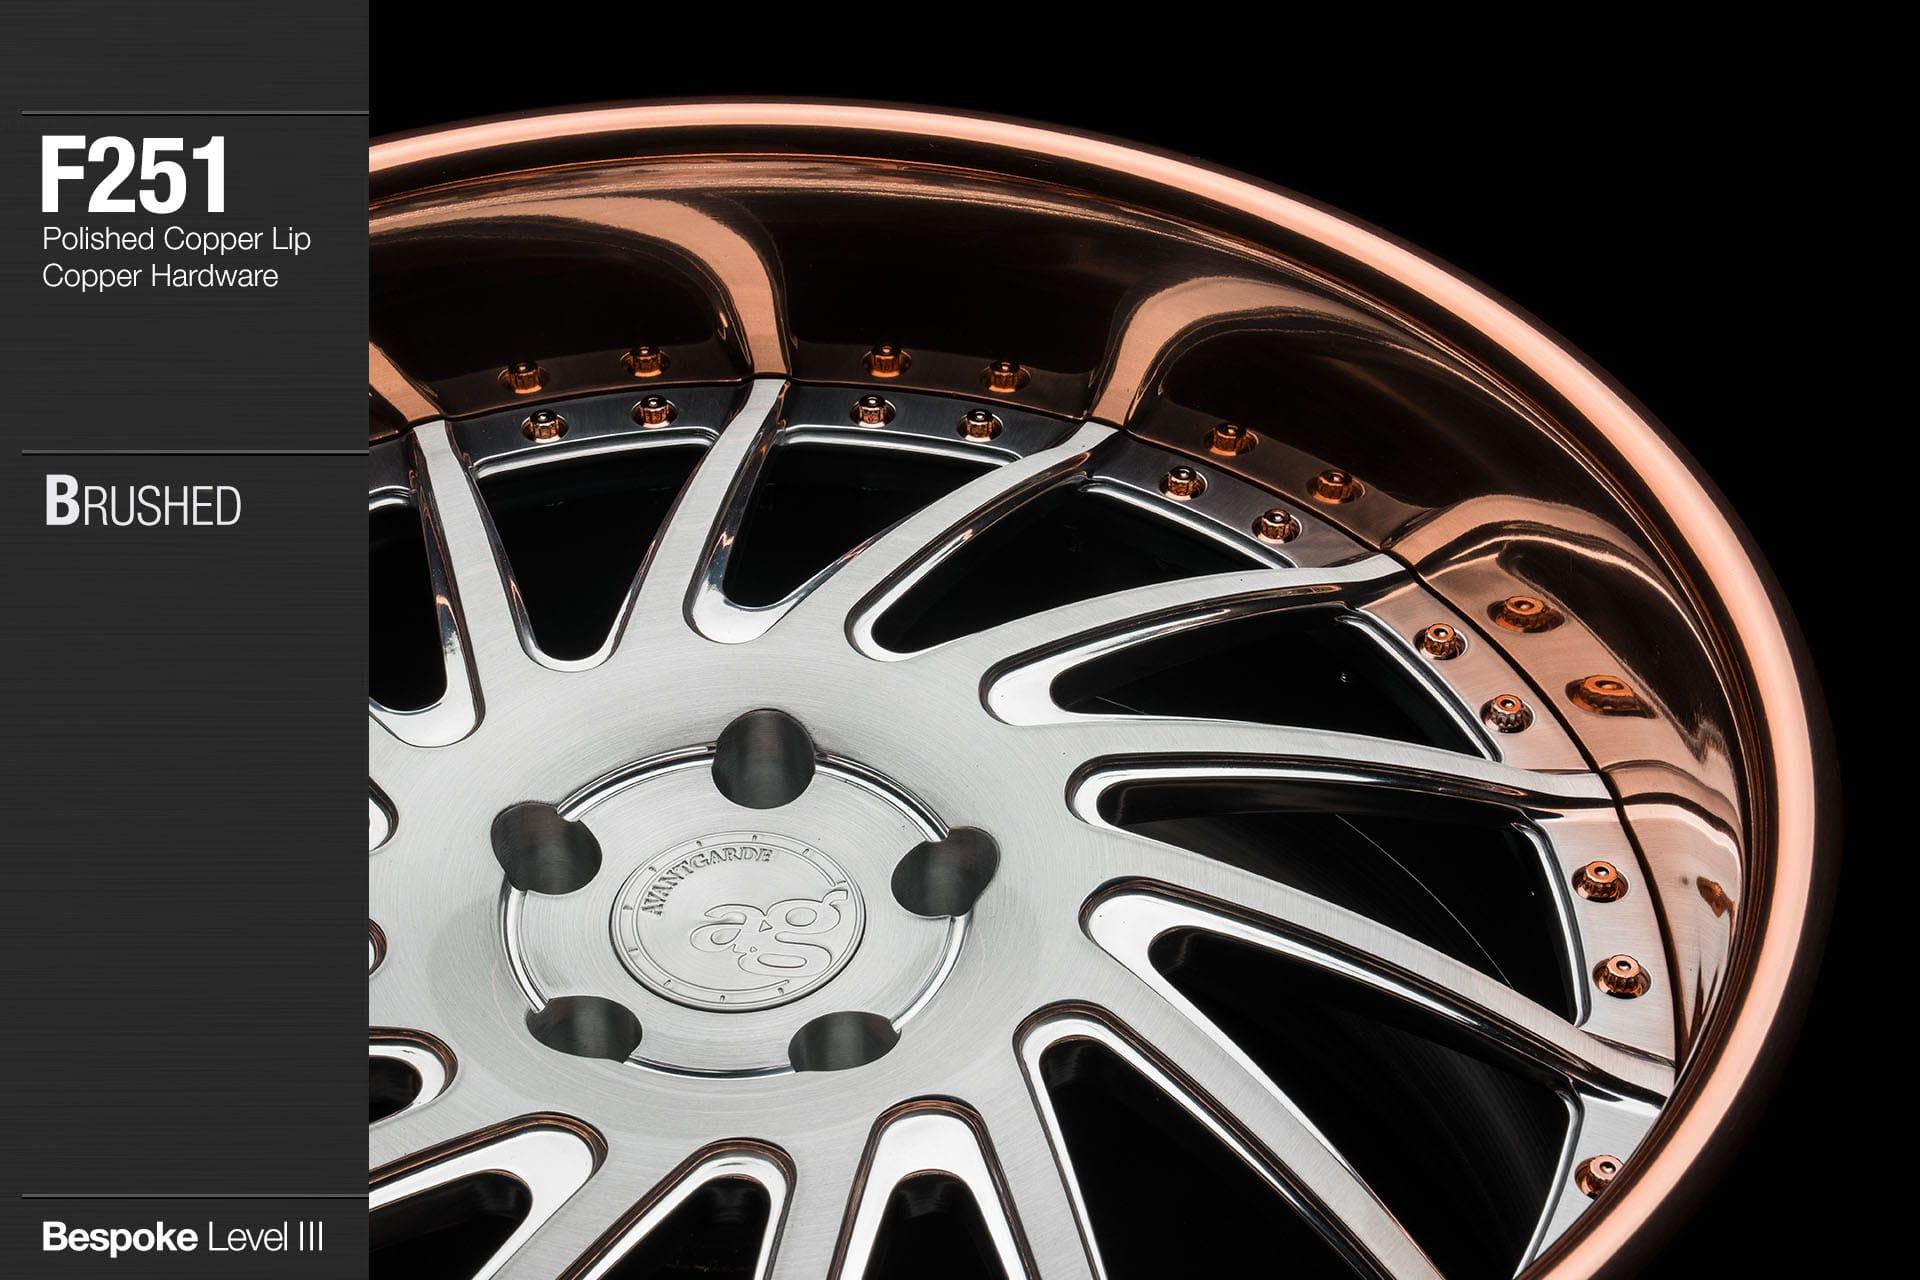 avant-garde-ag-wheels-f251-brushed-face-polished-copper-lip-hardware-2-min